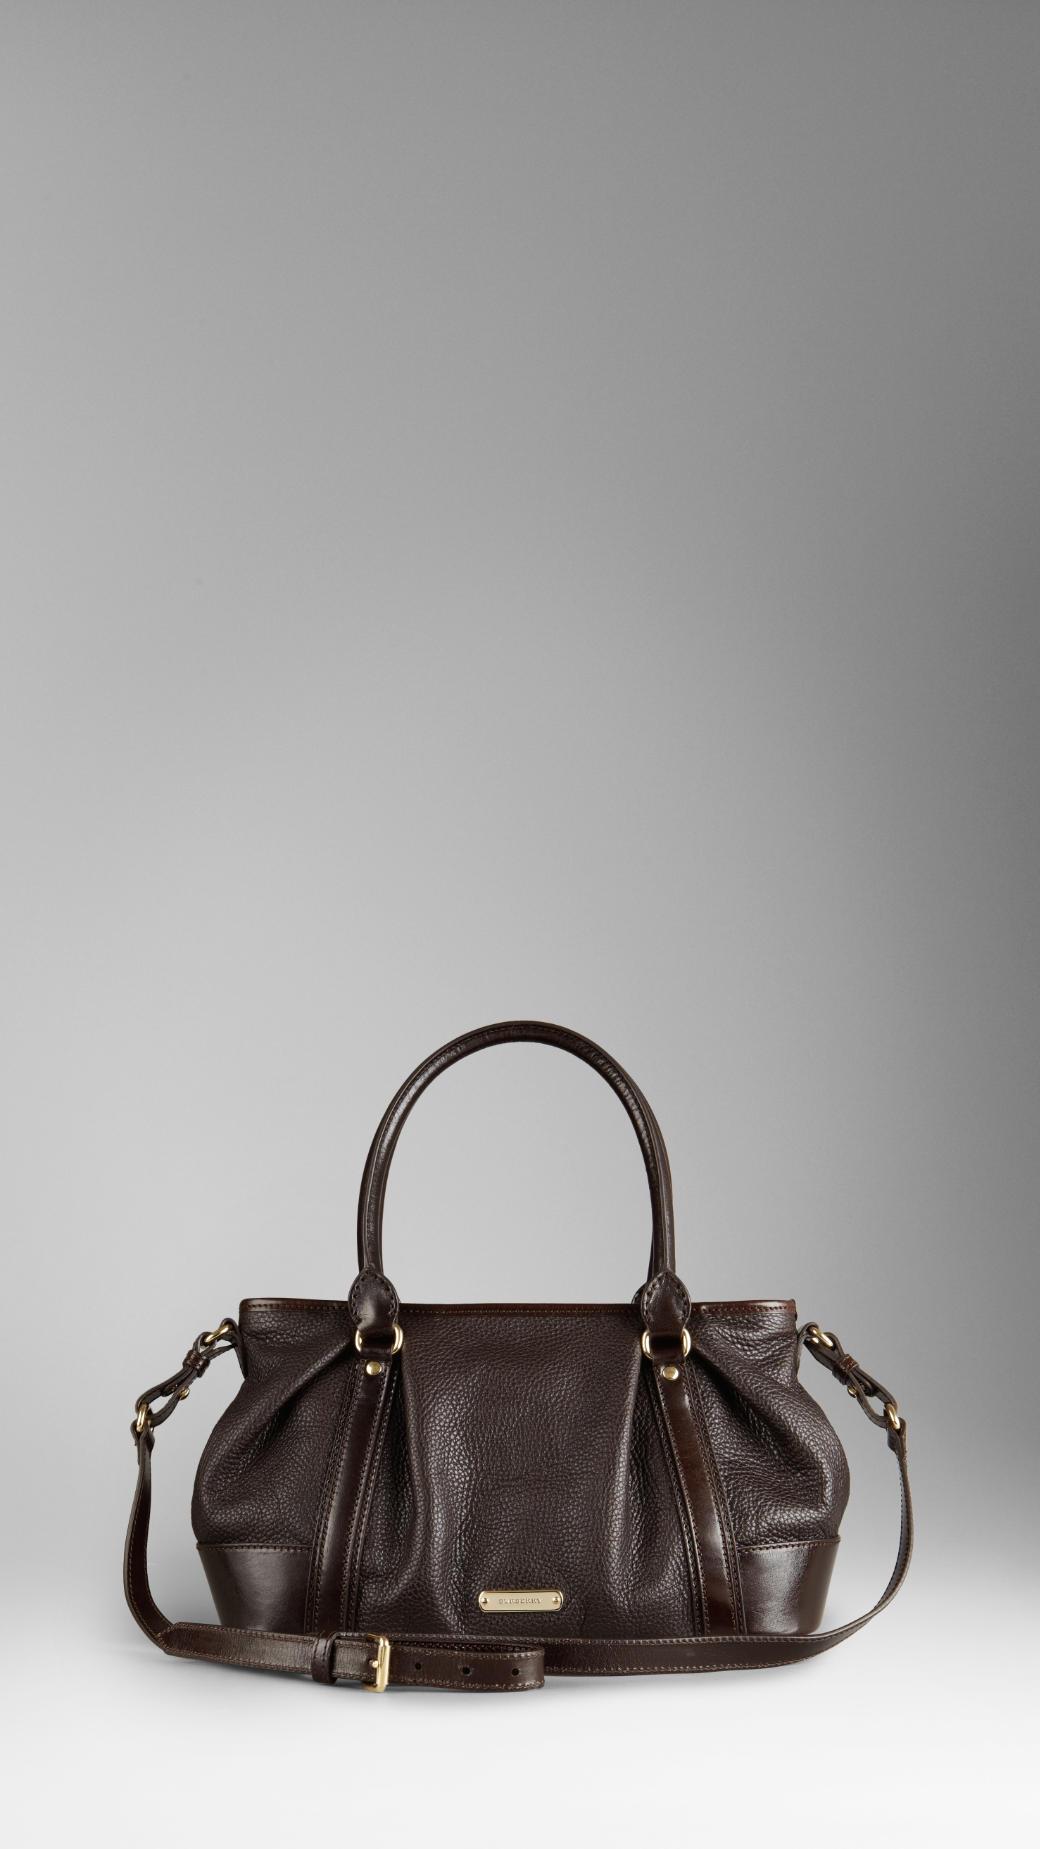 Burberry Medium Leather Bowling Bag in Brown - Lyst f309610c0ec91